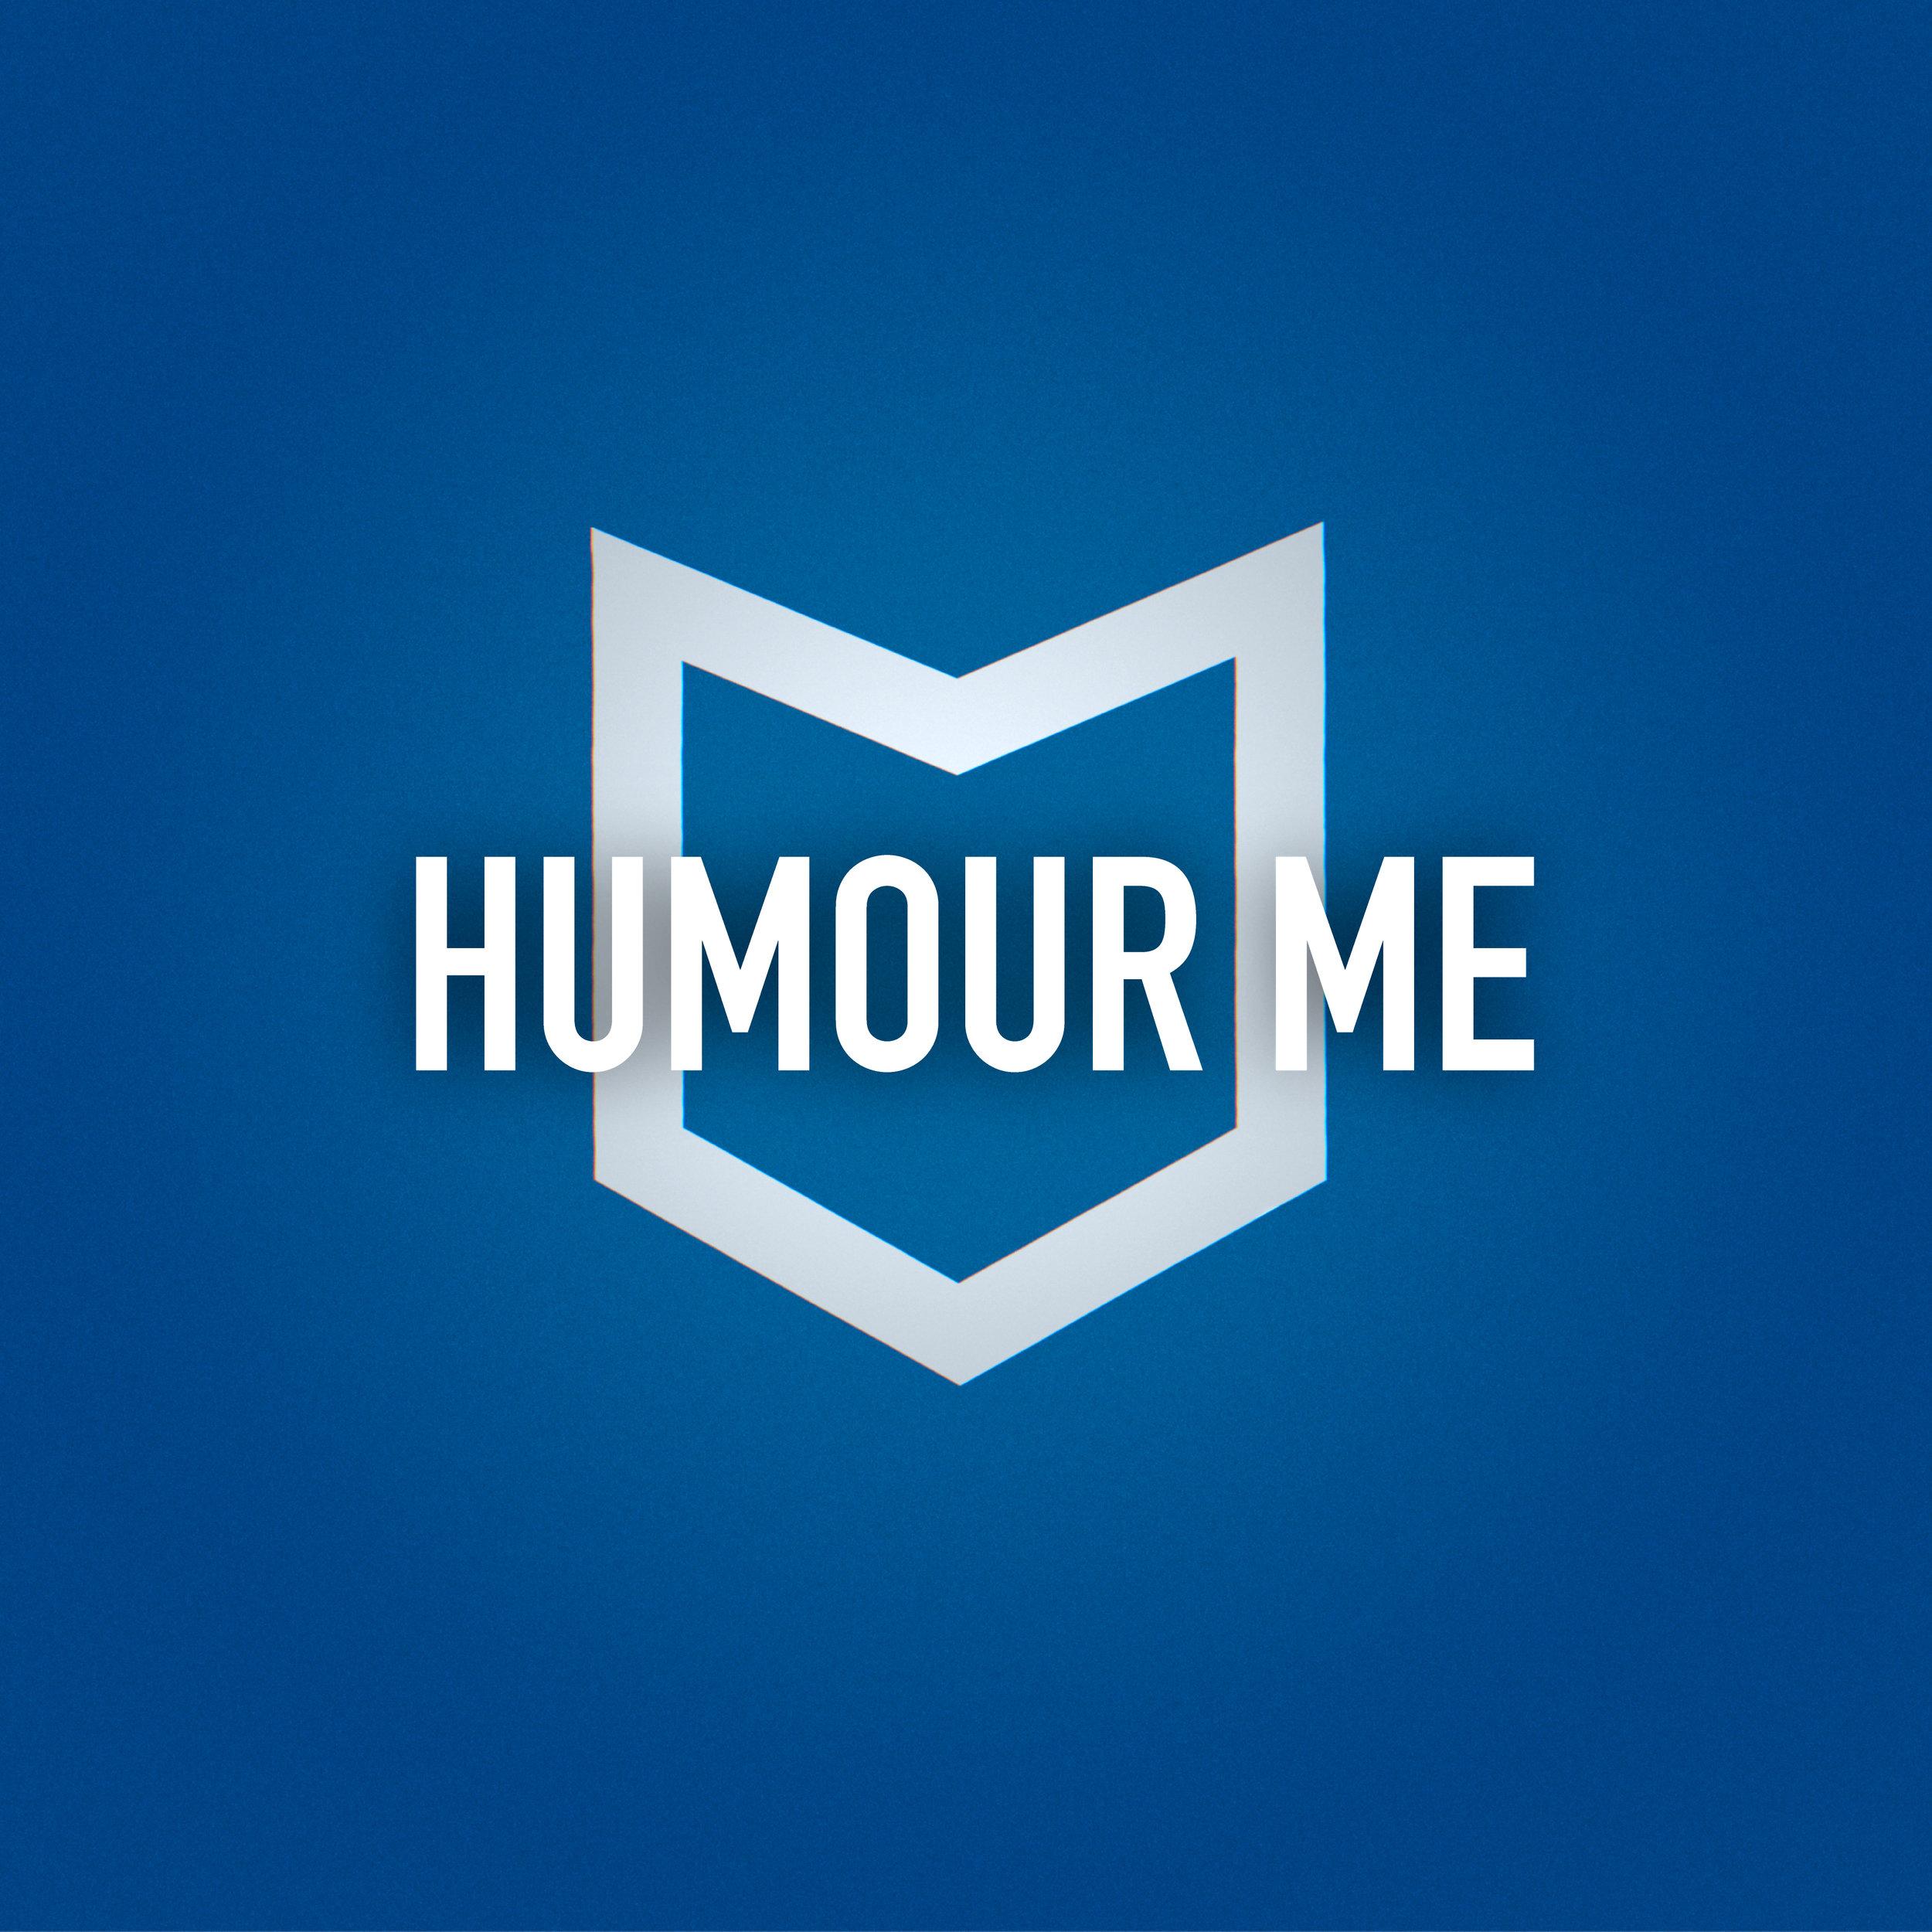 humourme